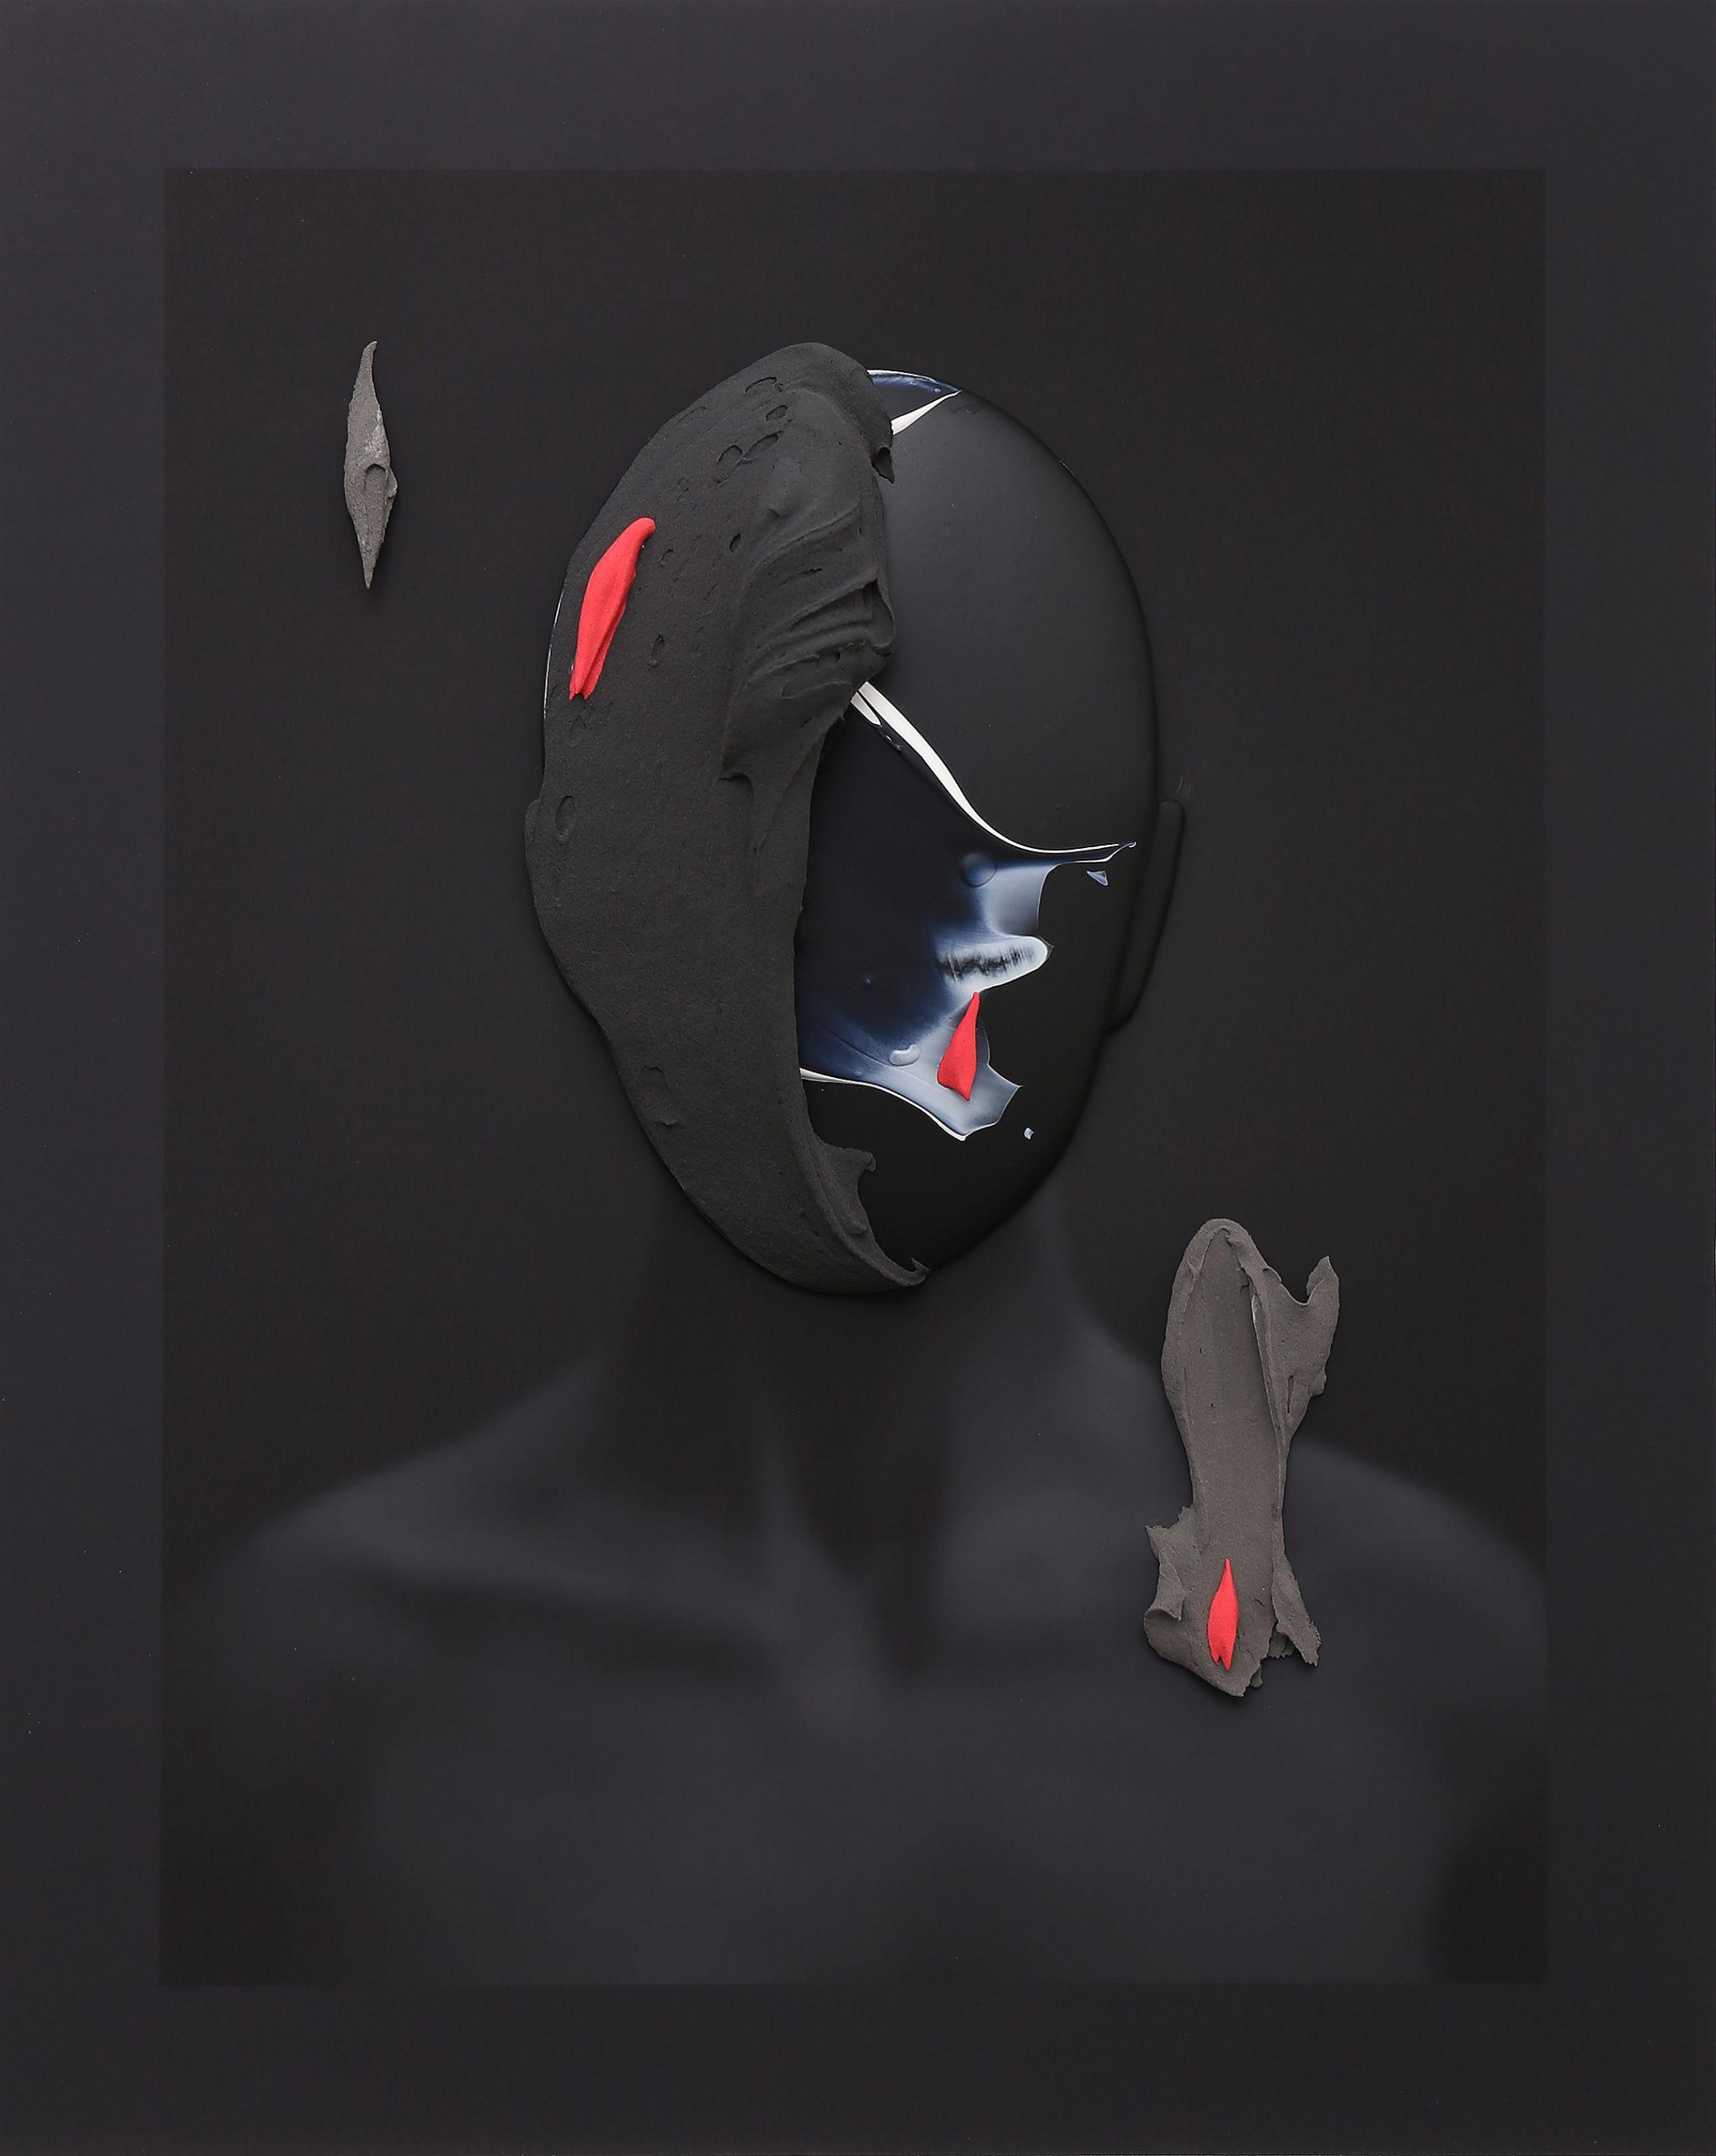 Portrait N.9 by Fabio La Fauci